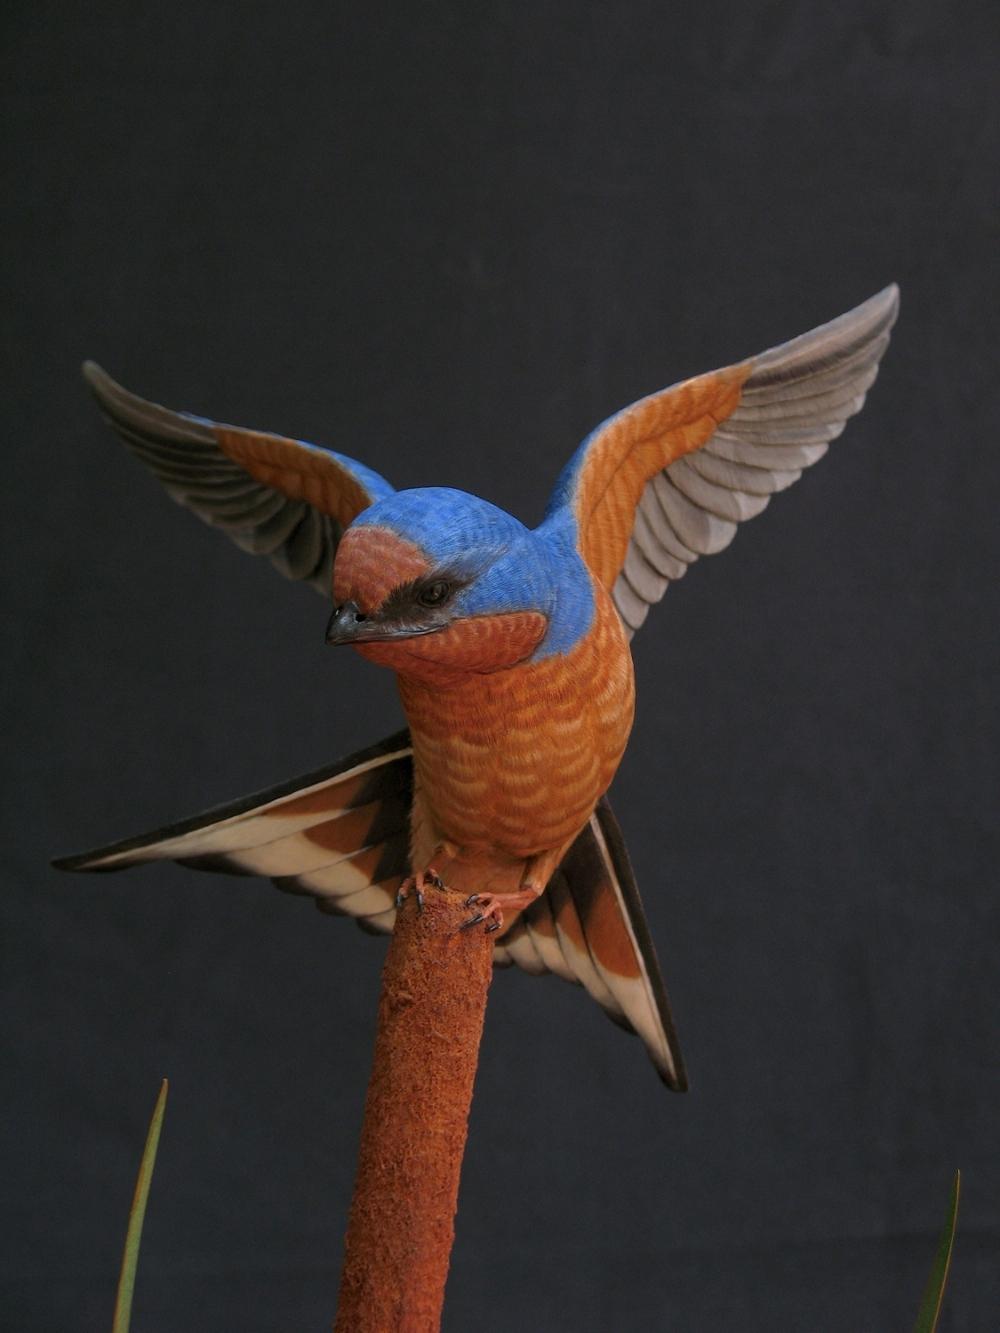 Barn Swallow, Life-sized, ♂